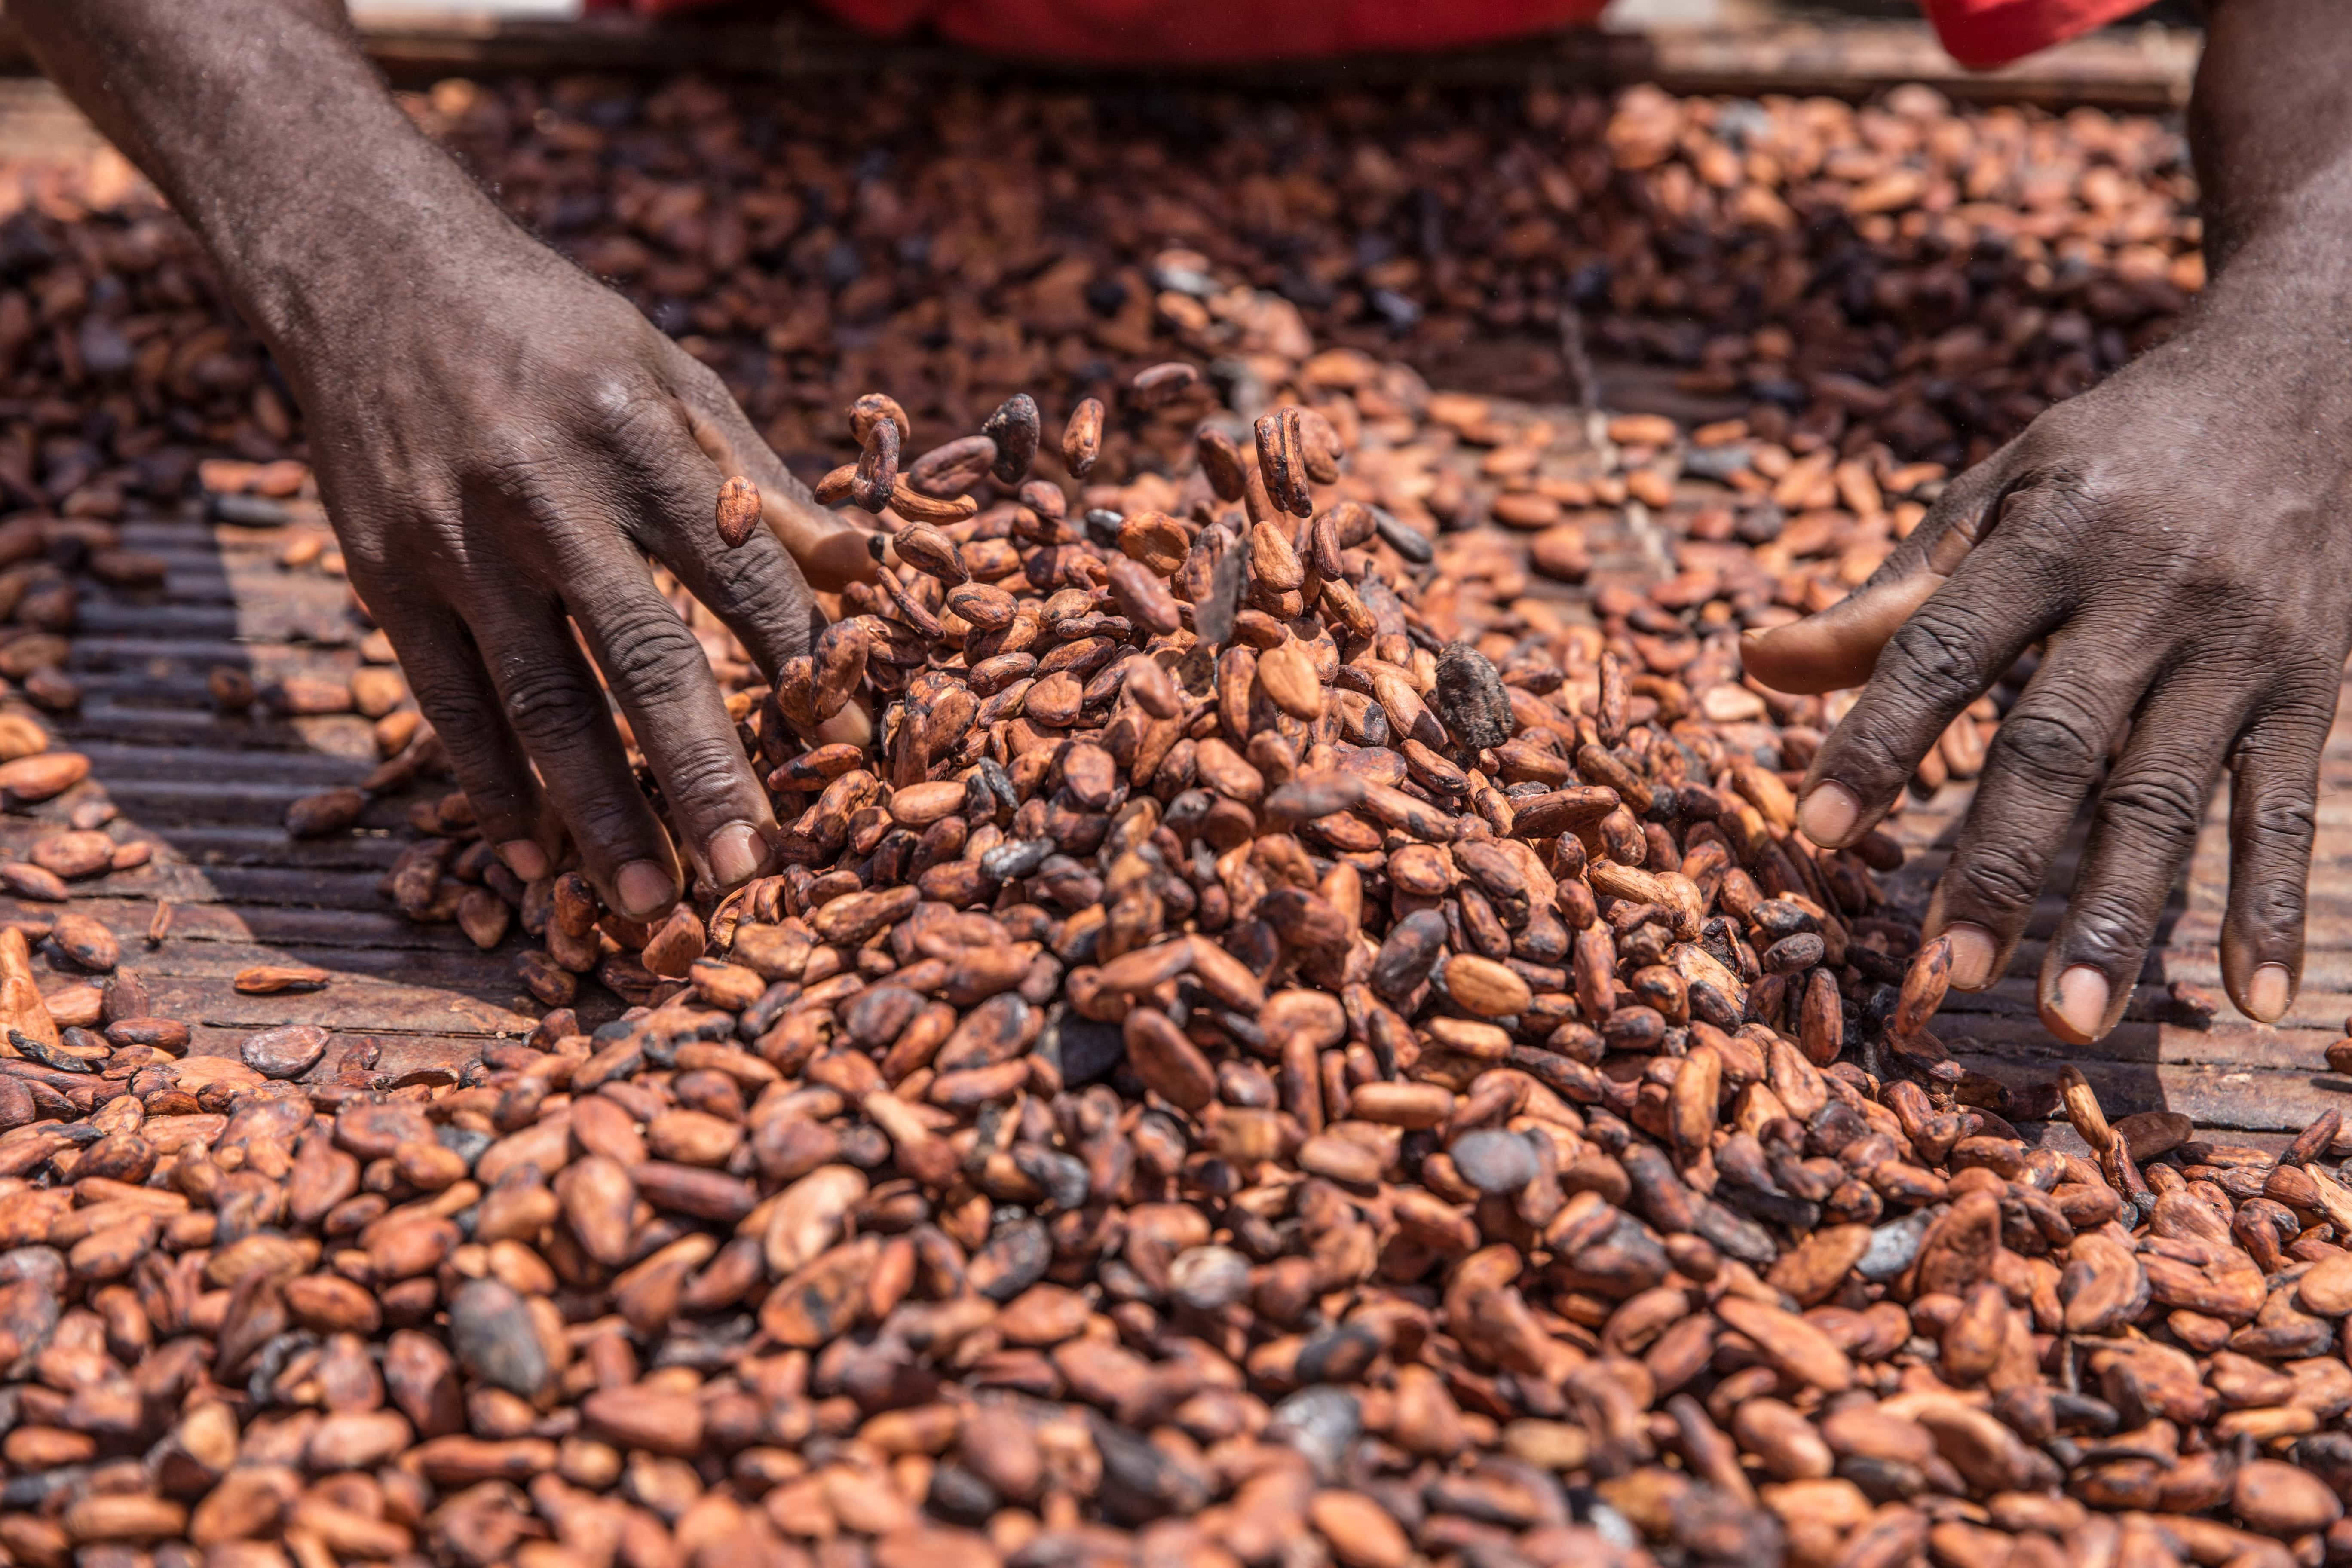 Deutsche-Politik-News.de | Cocoa farmer King Baudouin African Development Prize flickr.com